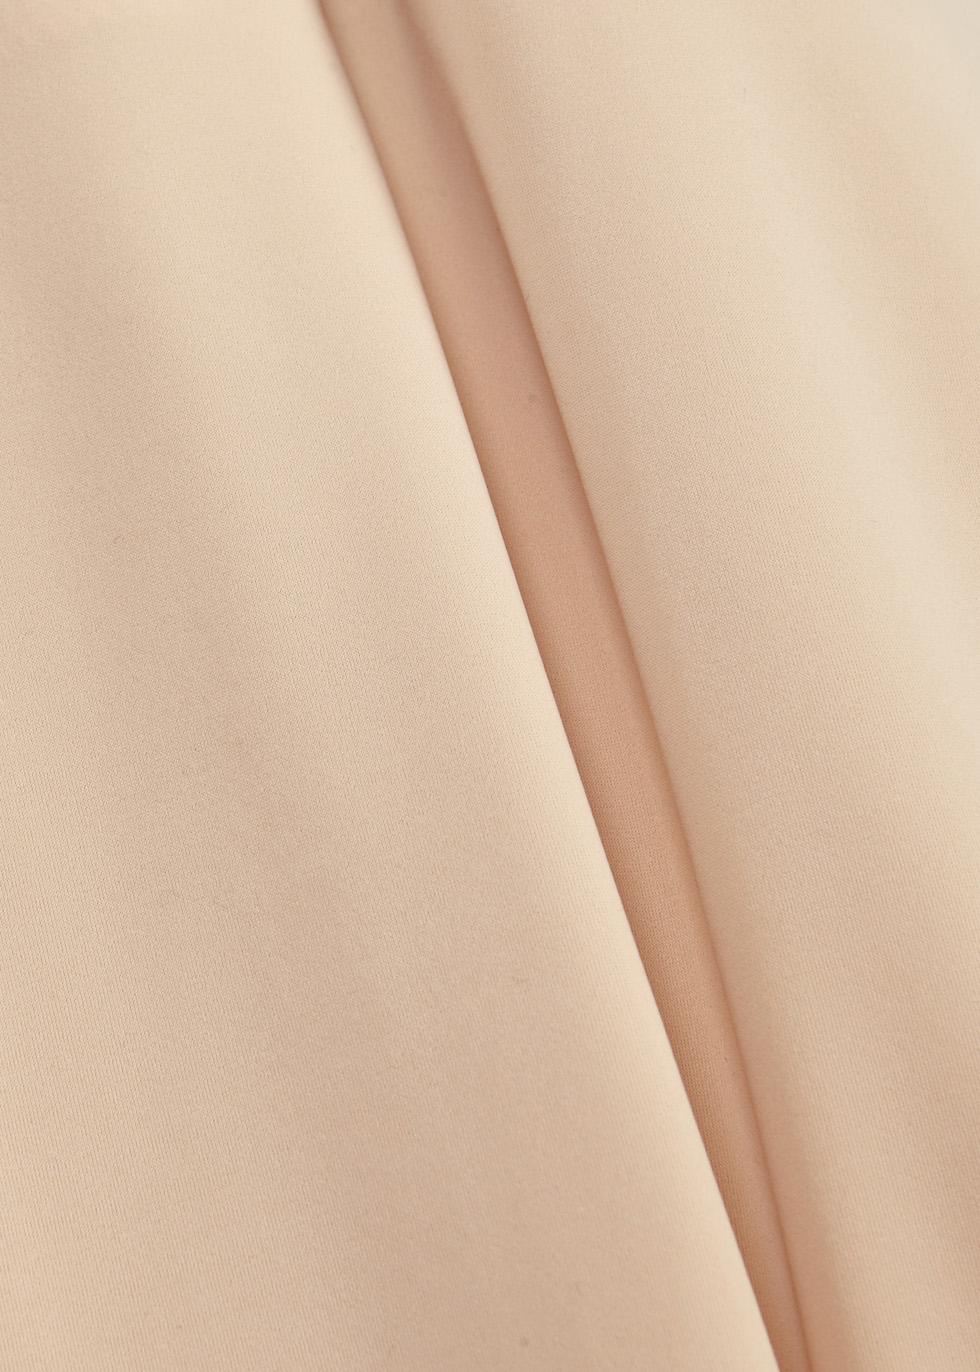 Beyond Naked shaping dress - Wacoal